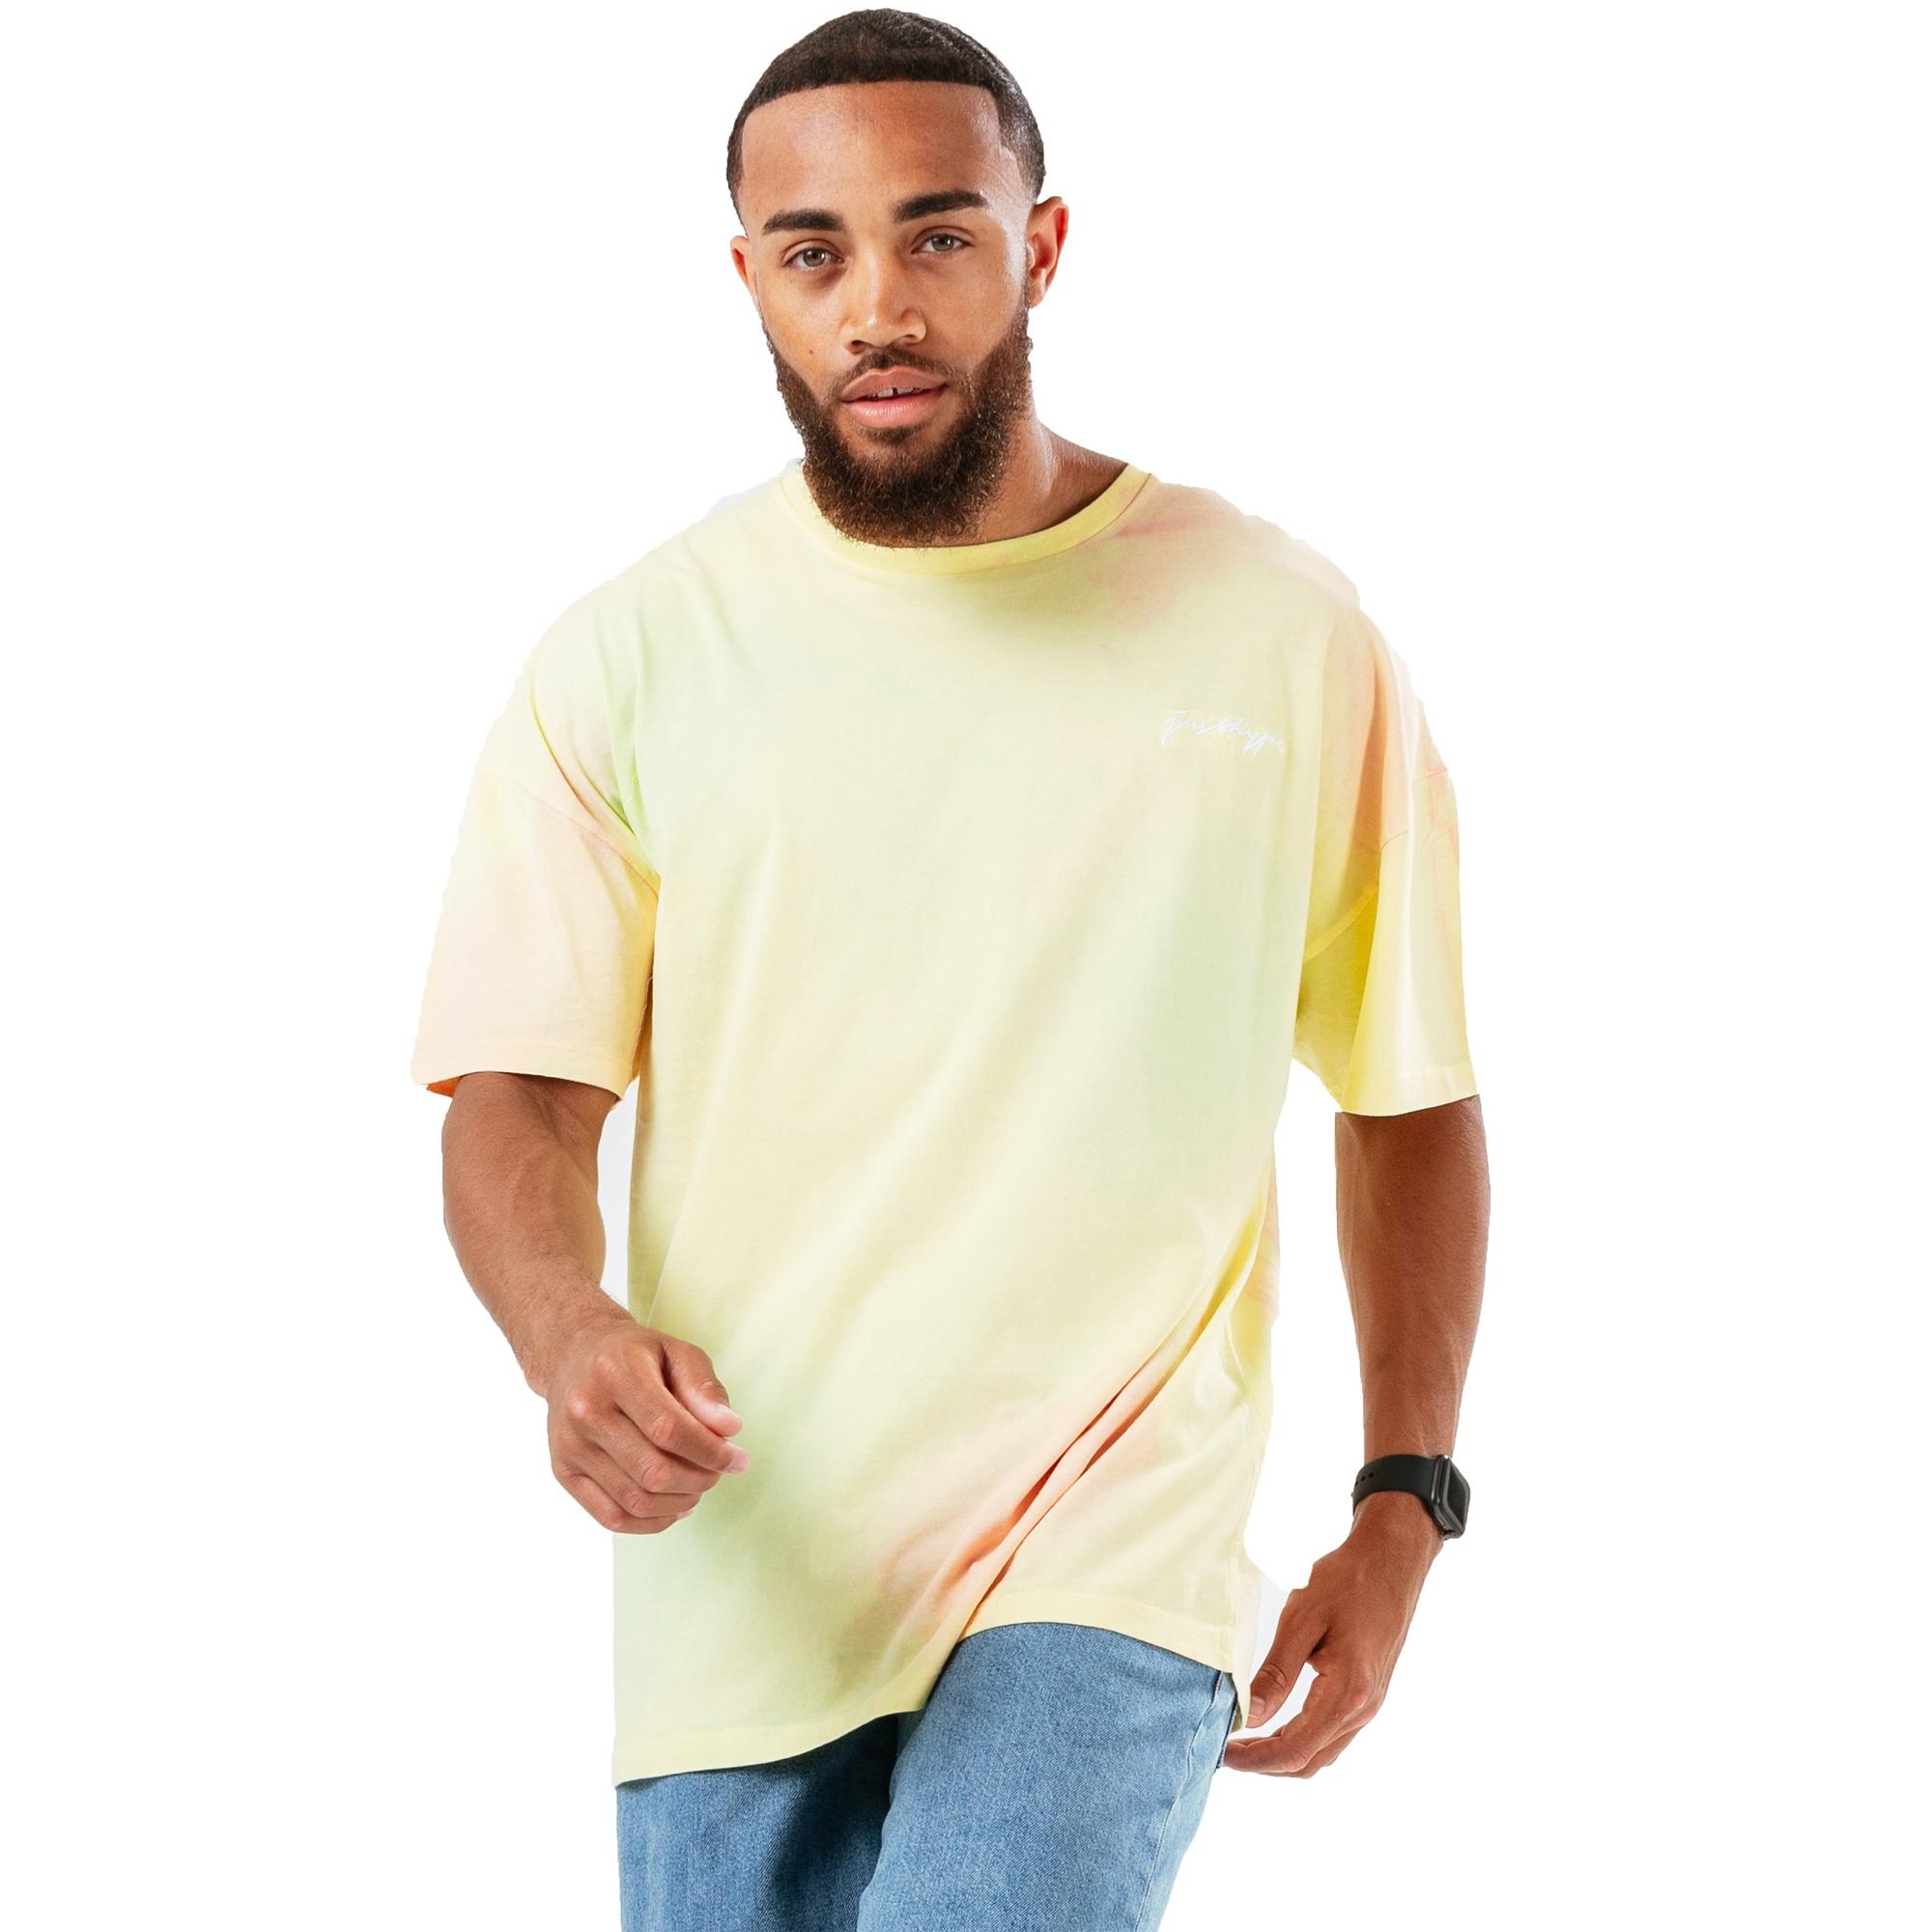 Hype Mens Candy Tie Dye Oversized T-Shirt (XL) (Light Yellow/Pale Pink)